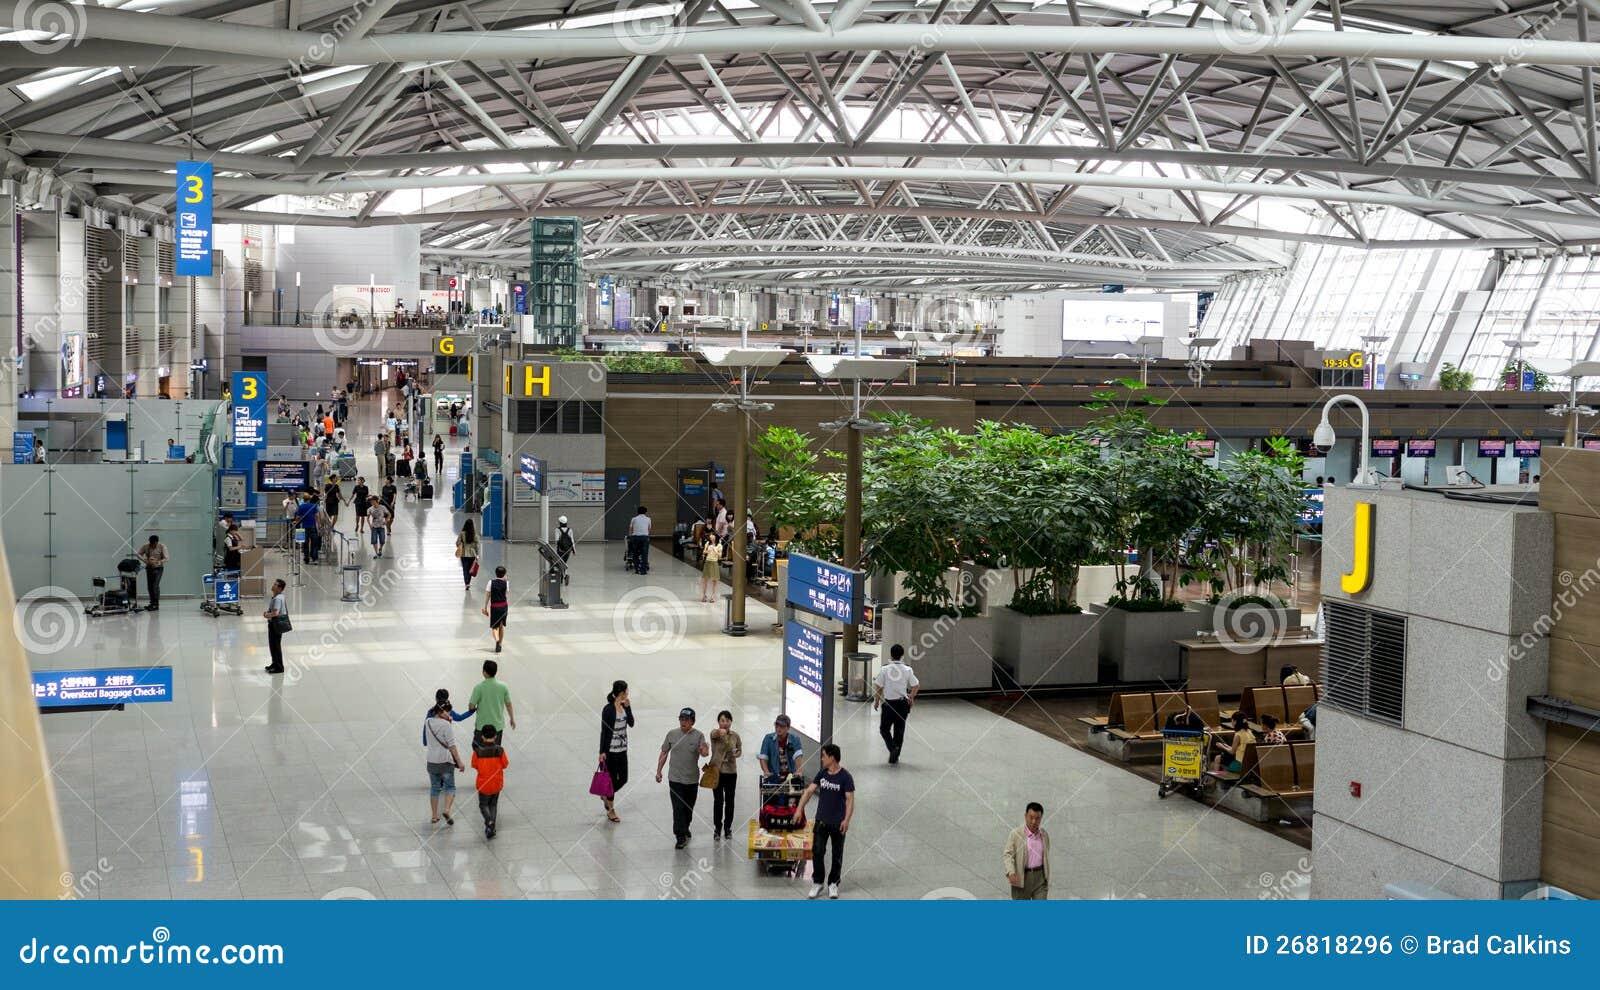 Aeroporto di Soeul Incheon